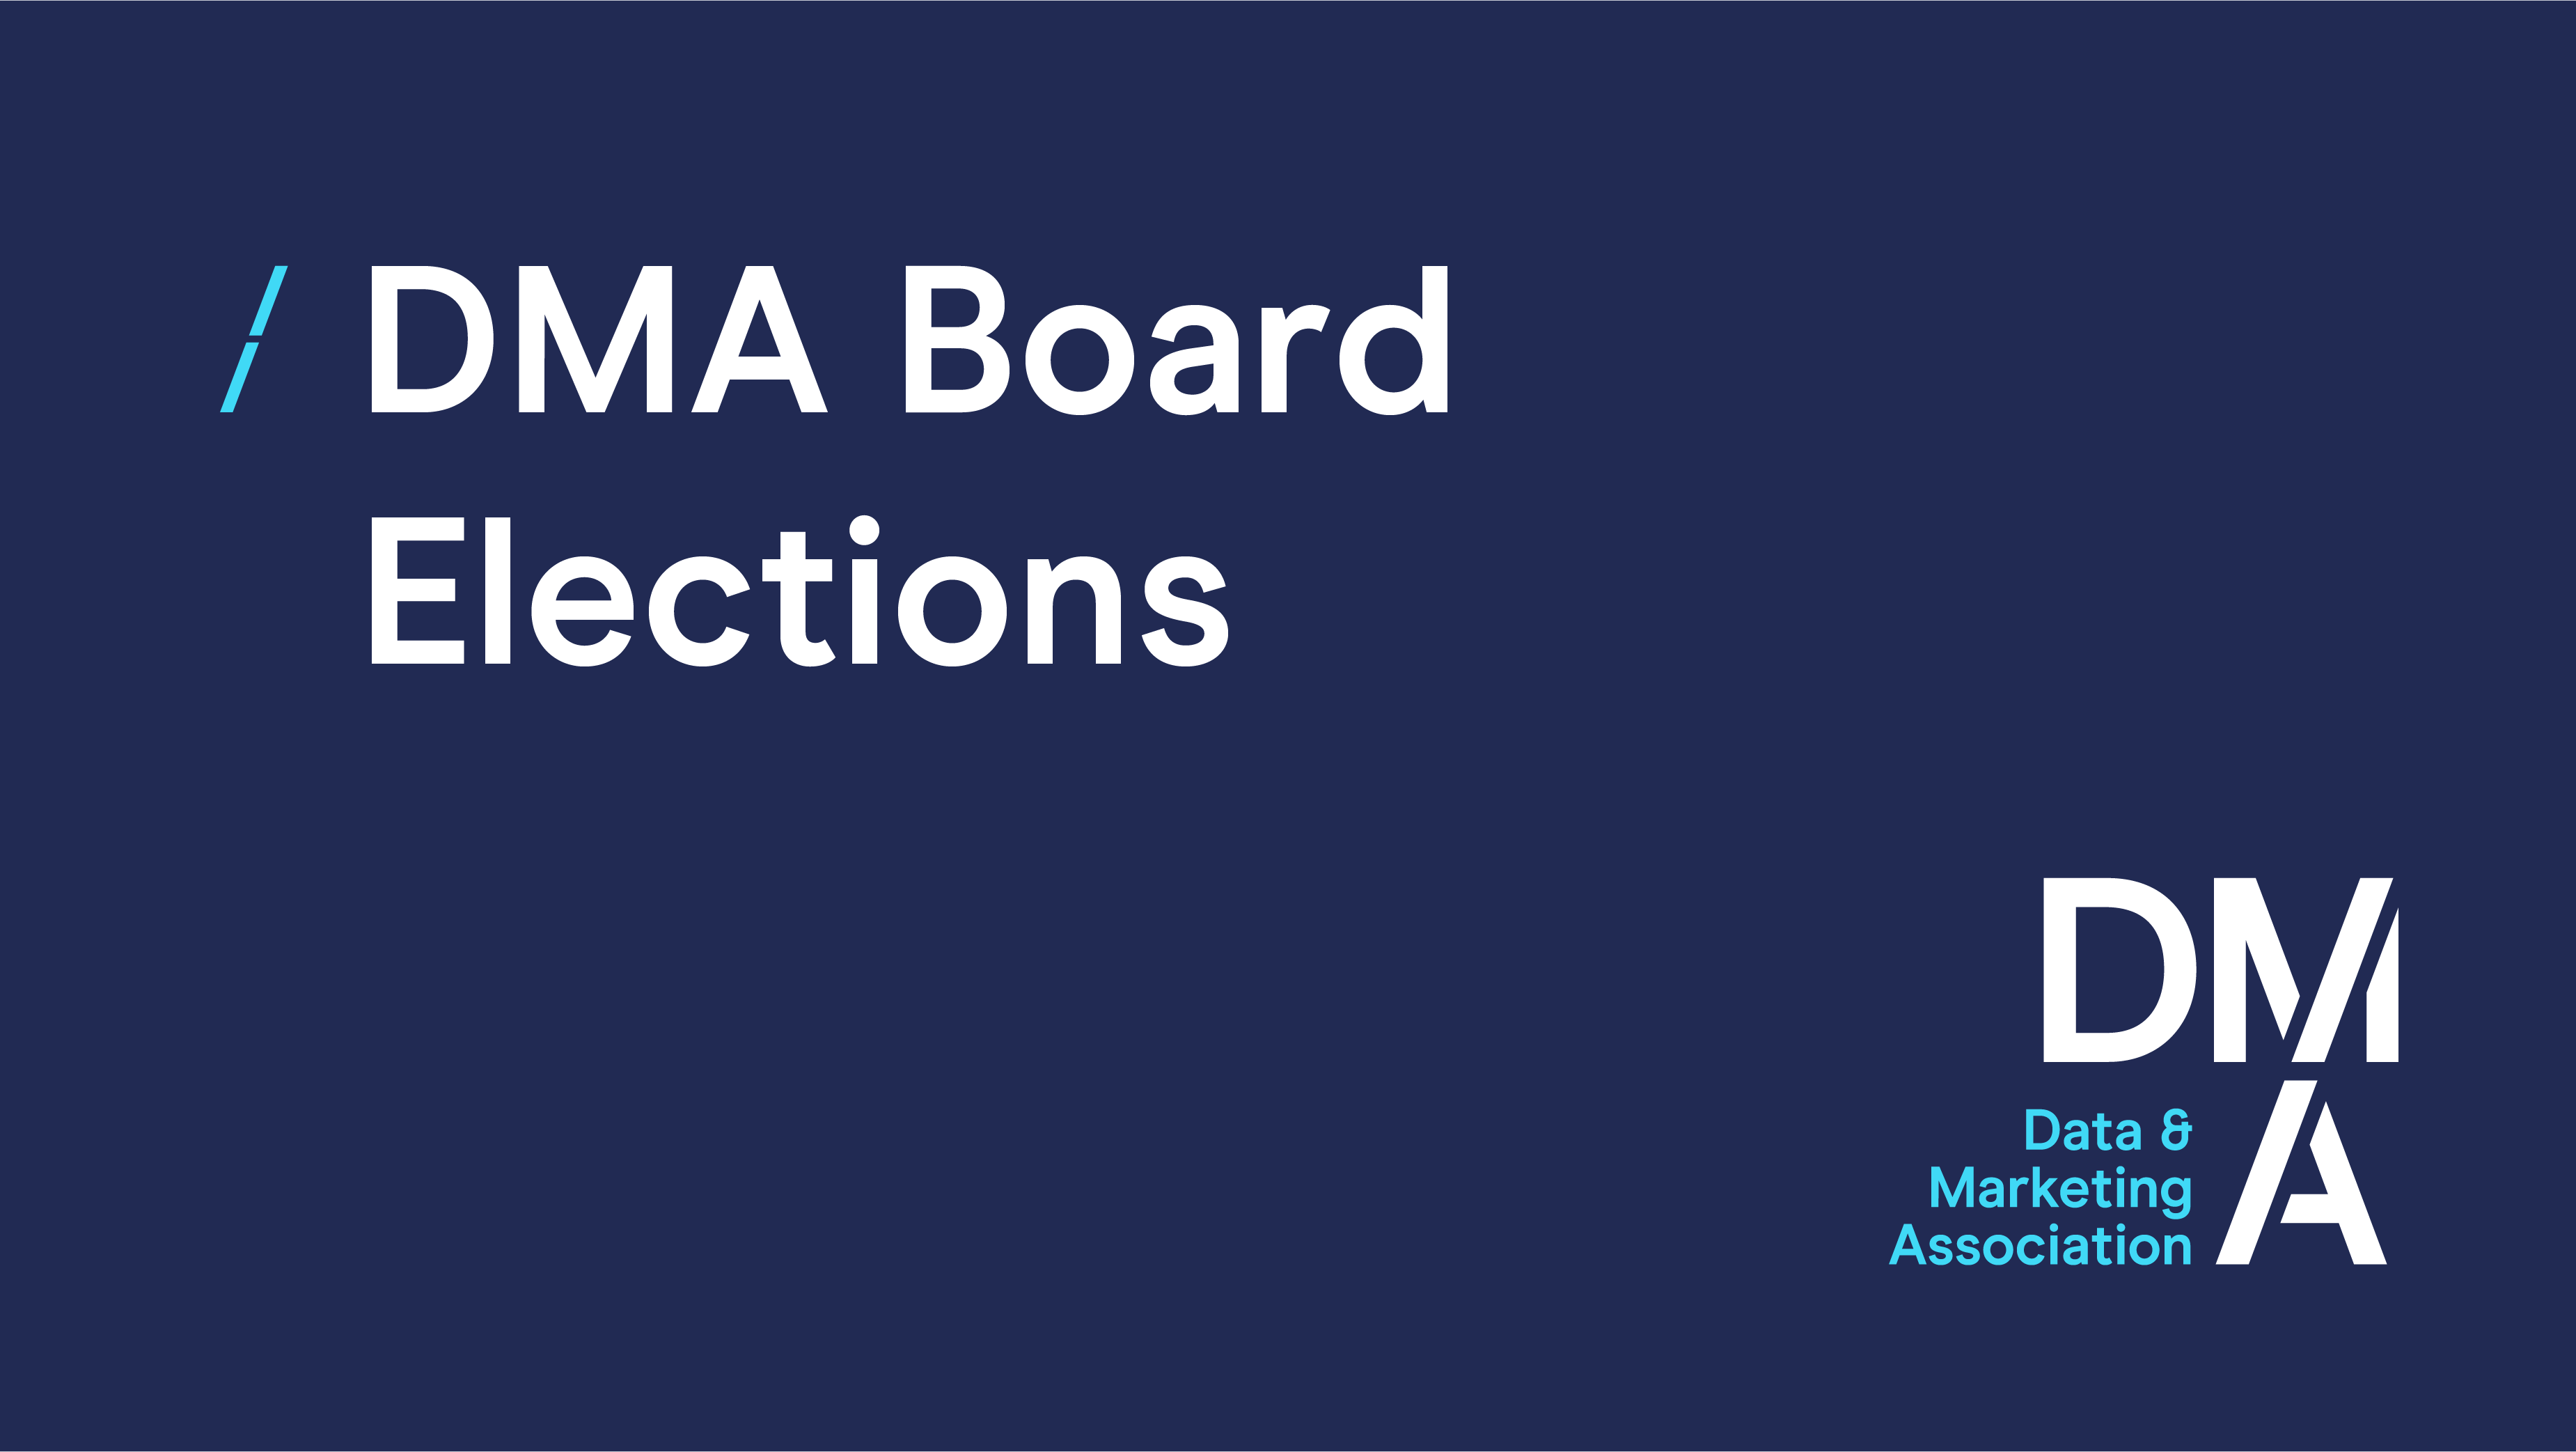 dma-board-elections_dma.png